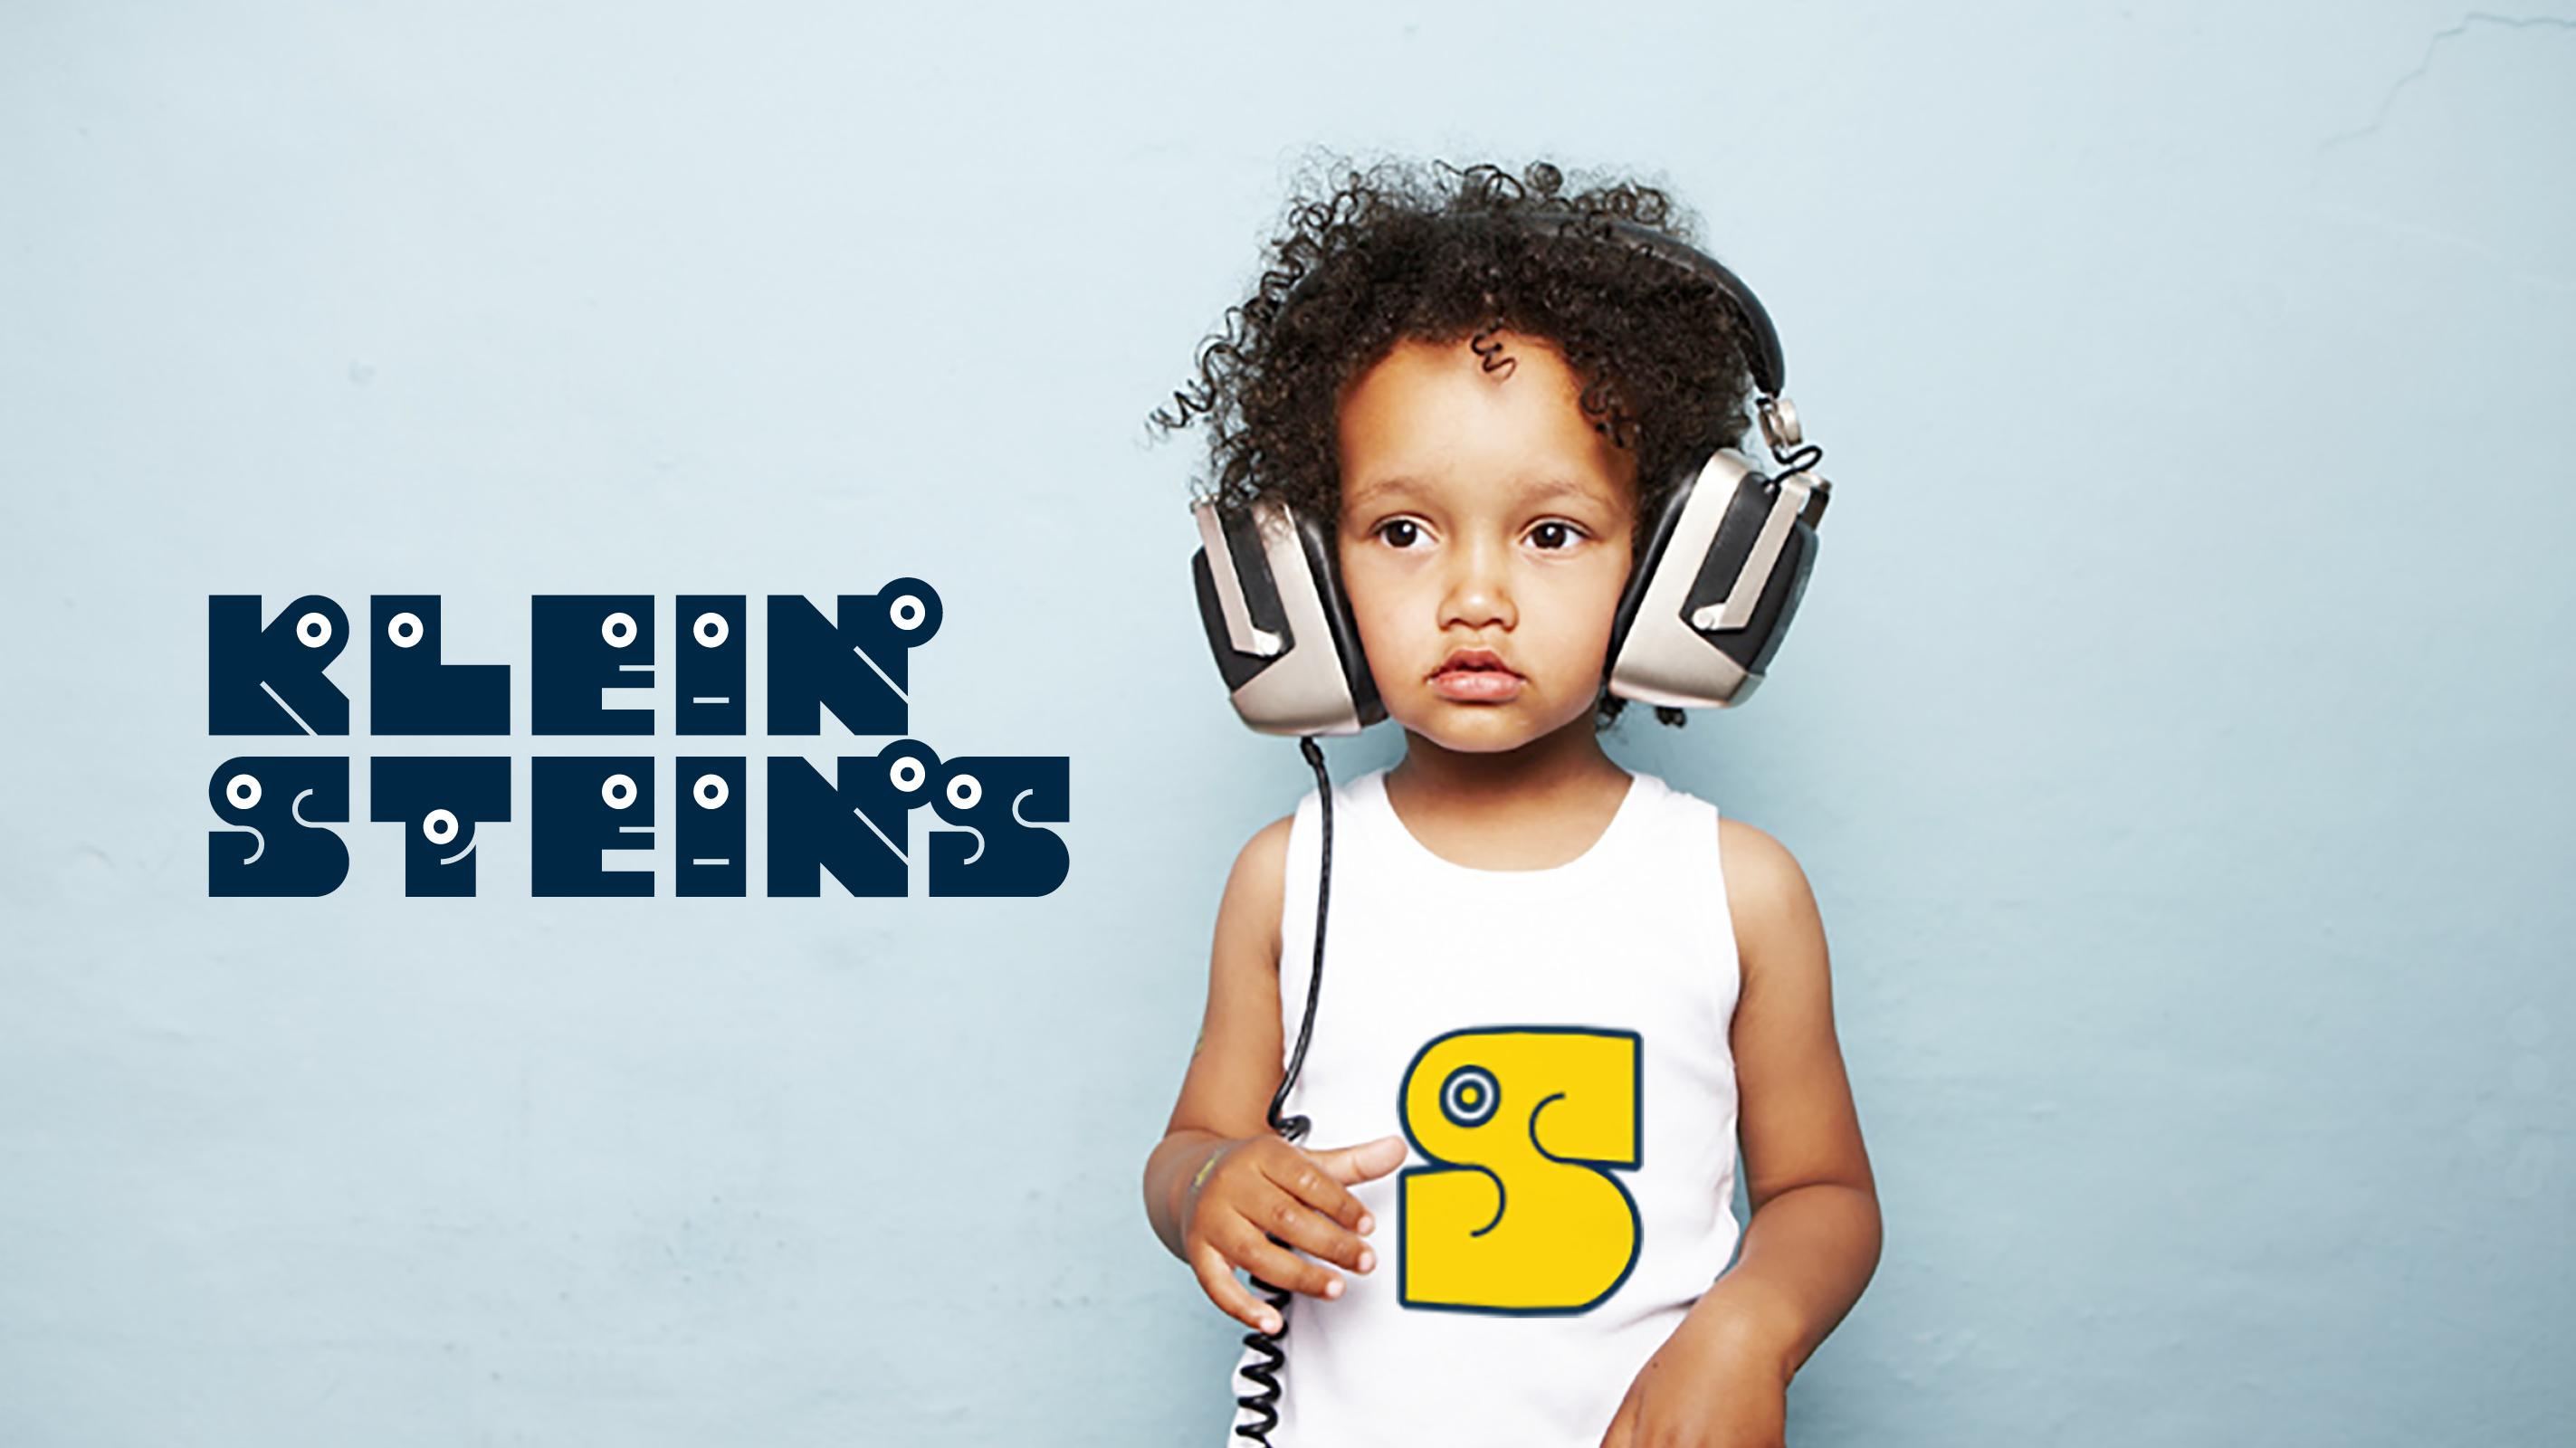 Kleinsteins Kita – Poarangan Brand Design3